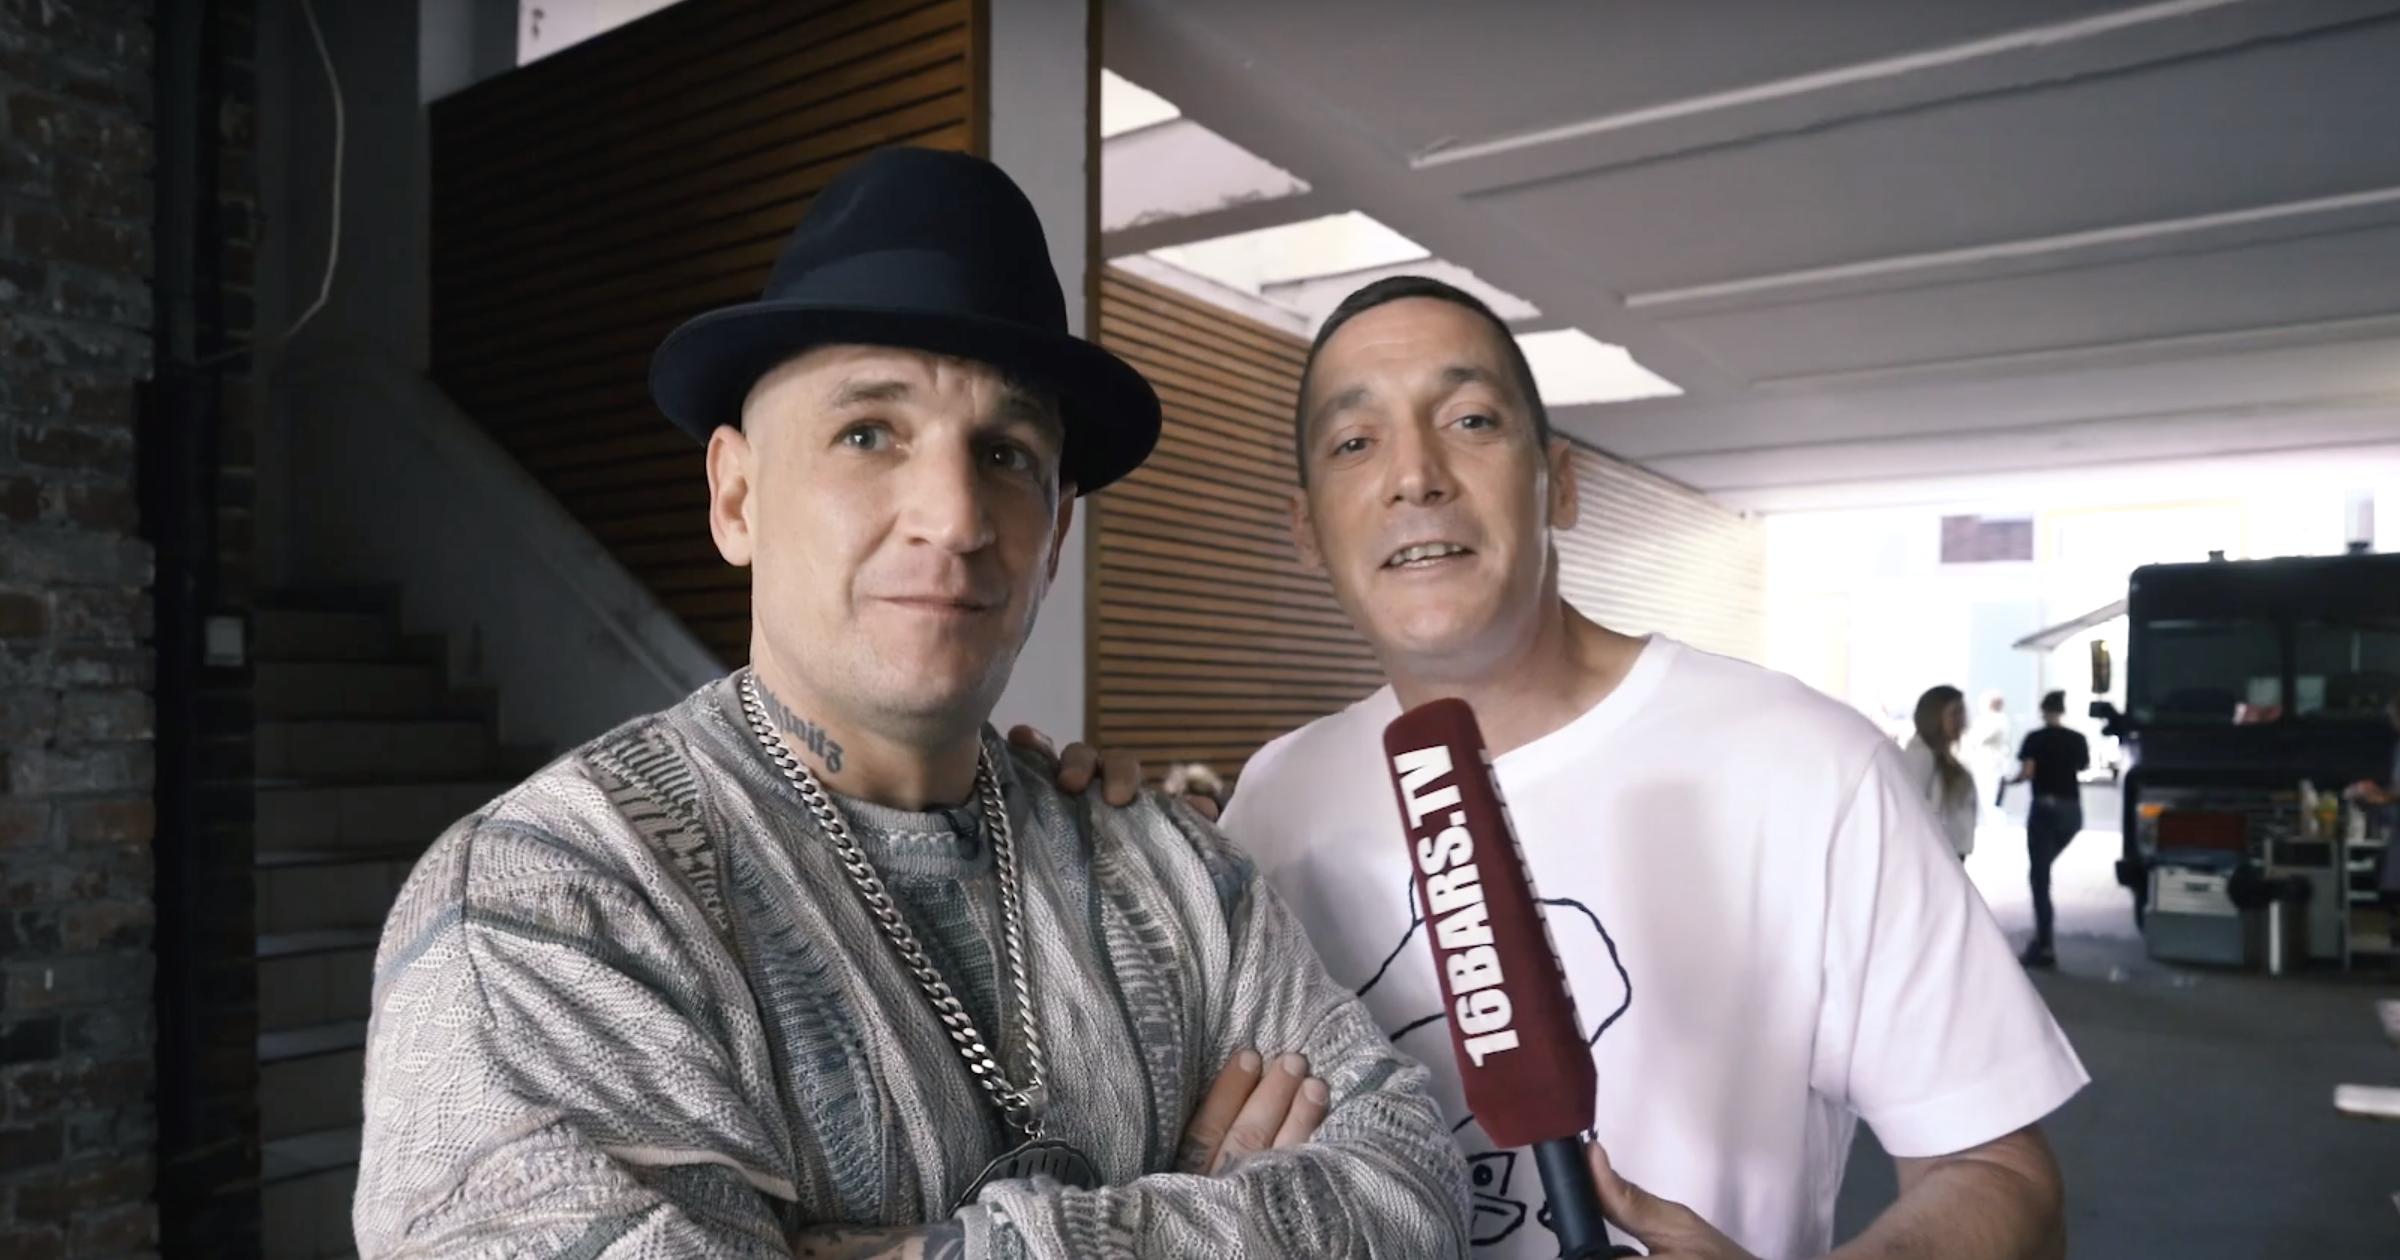 $ick bei Yo! MTV Raps: Olexesh, MC Bogy & Die Atzen | 16BARS